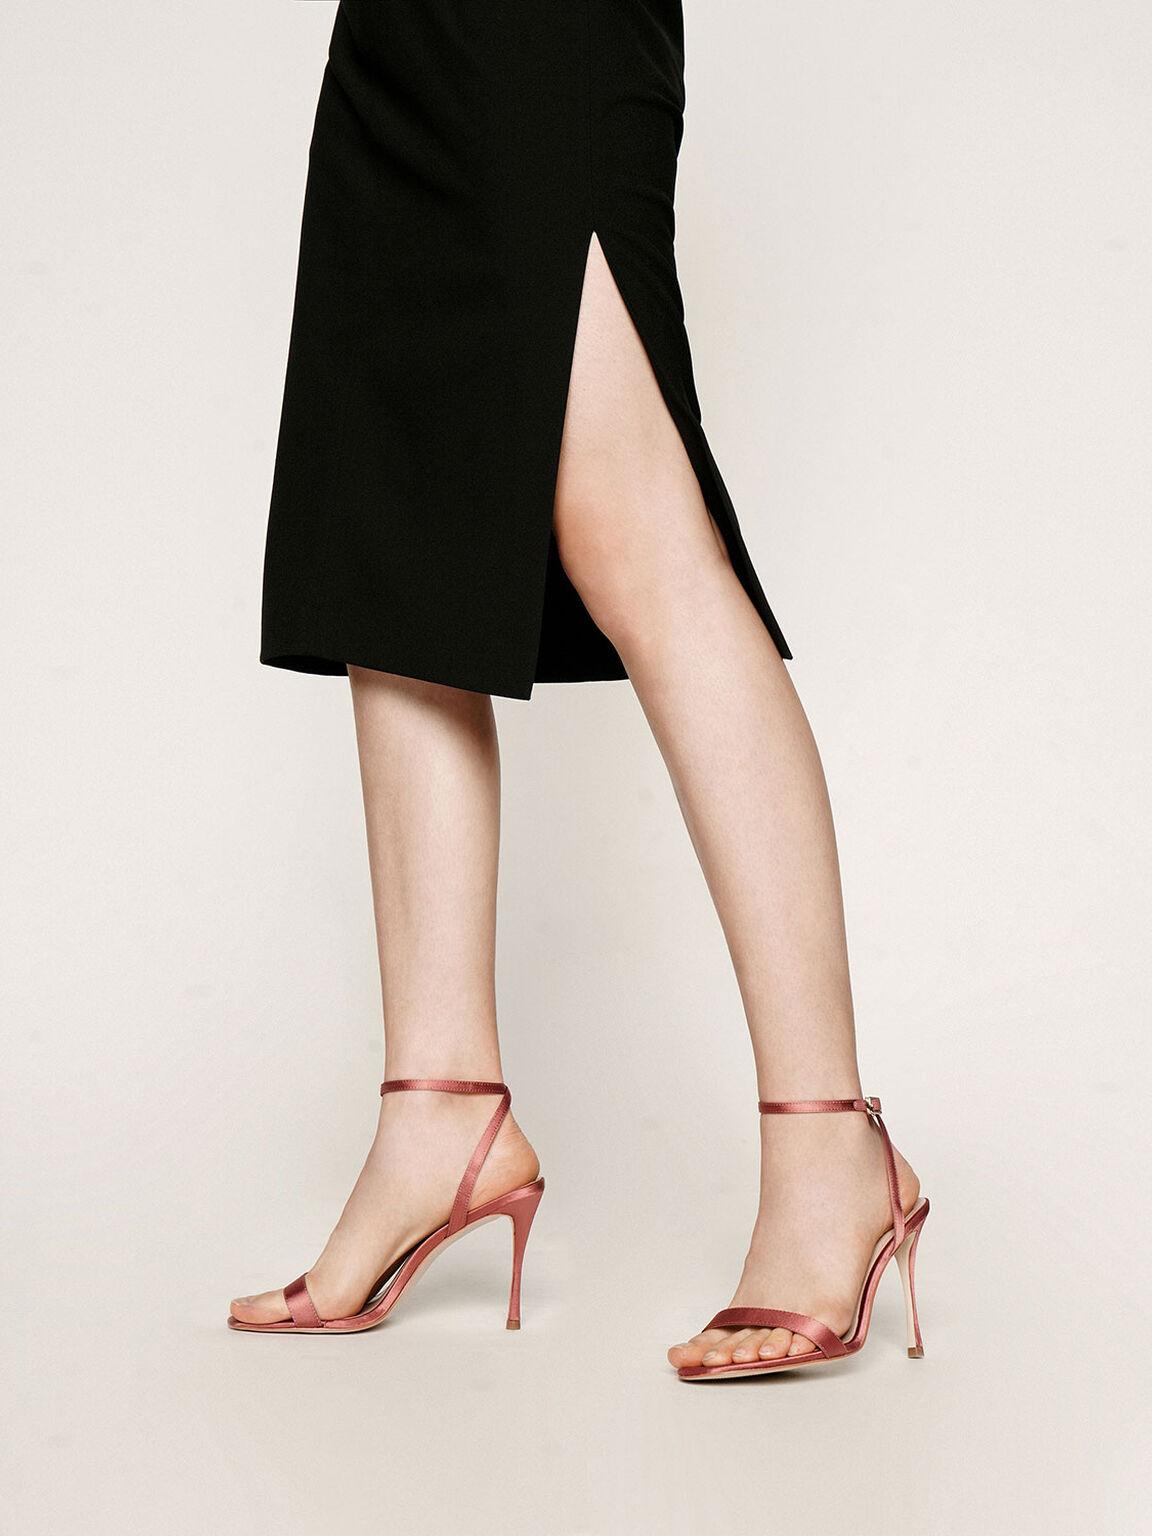 Satin Stiletto Heels, Pink, hi-res